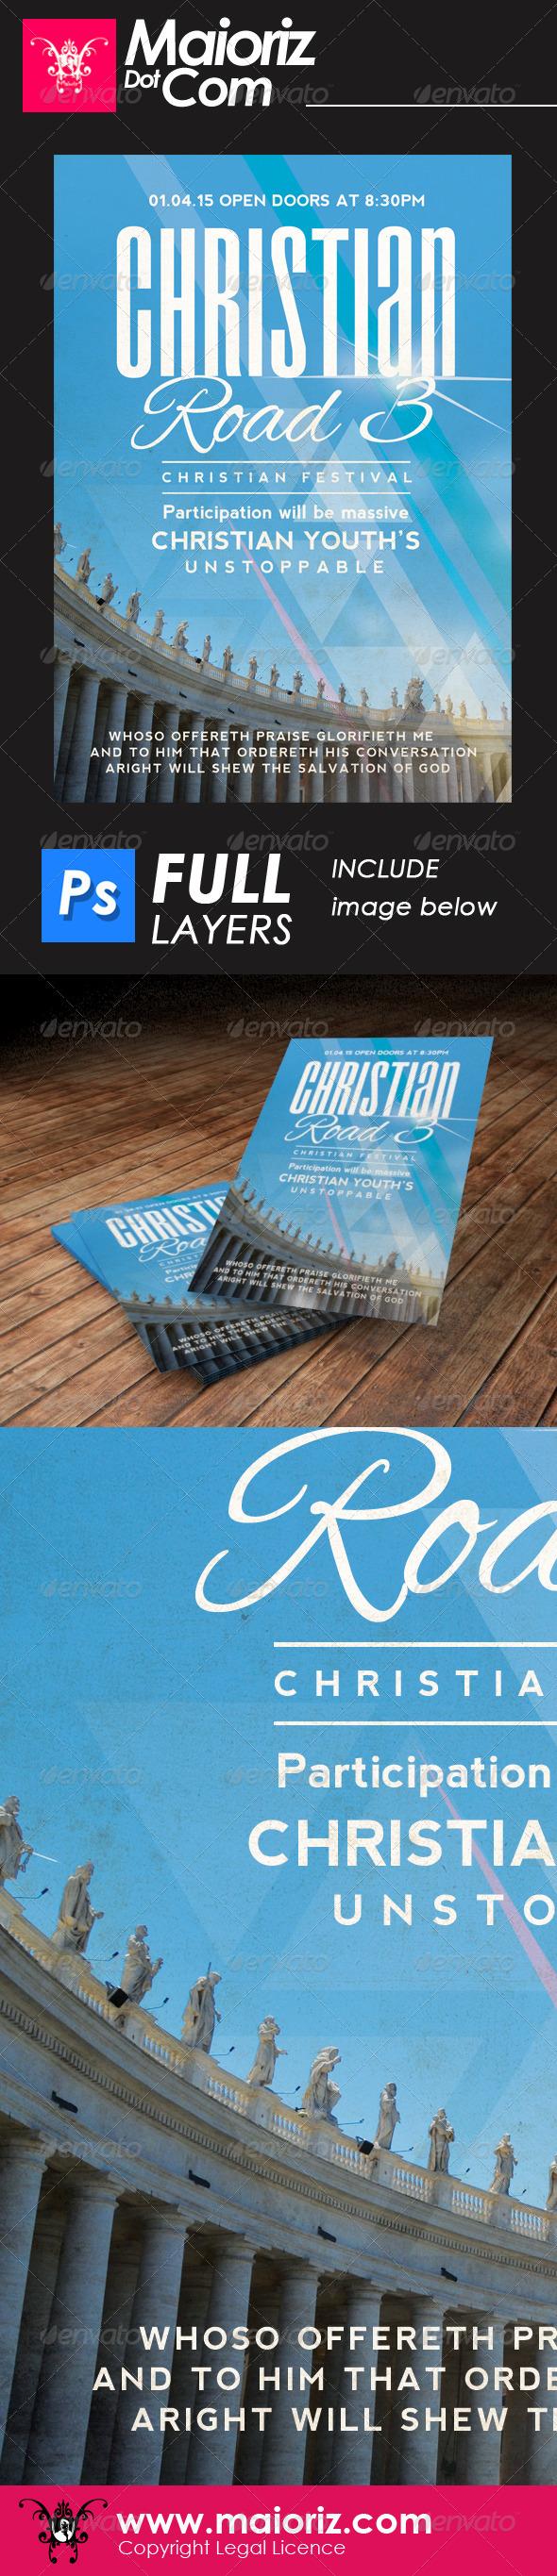 Christian Road 3 Flyer Church - Church Flyers